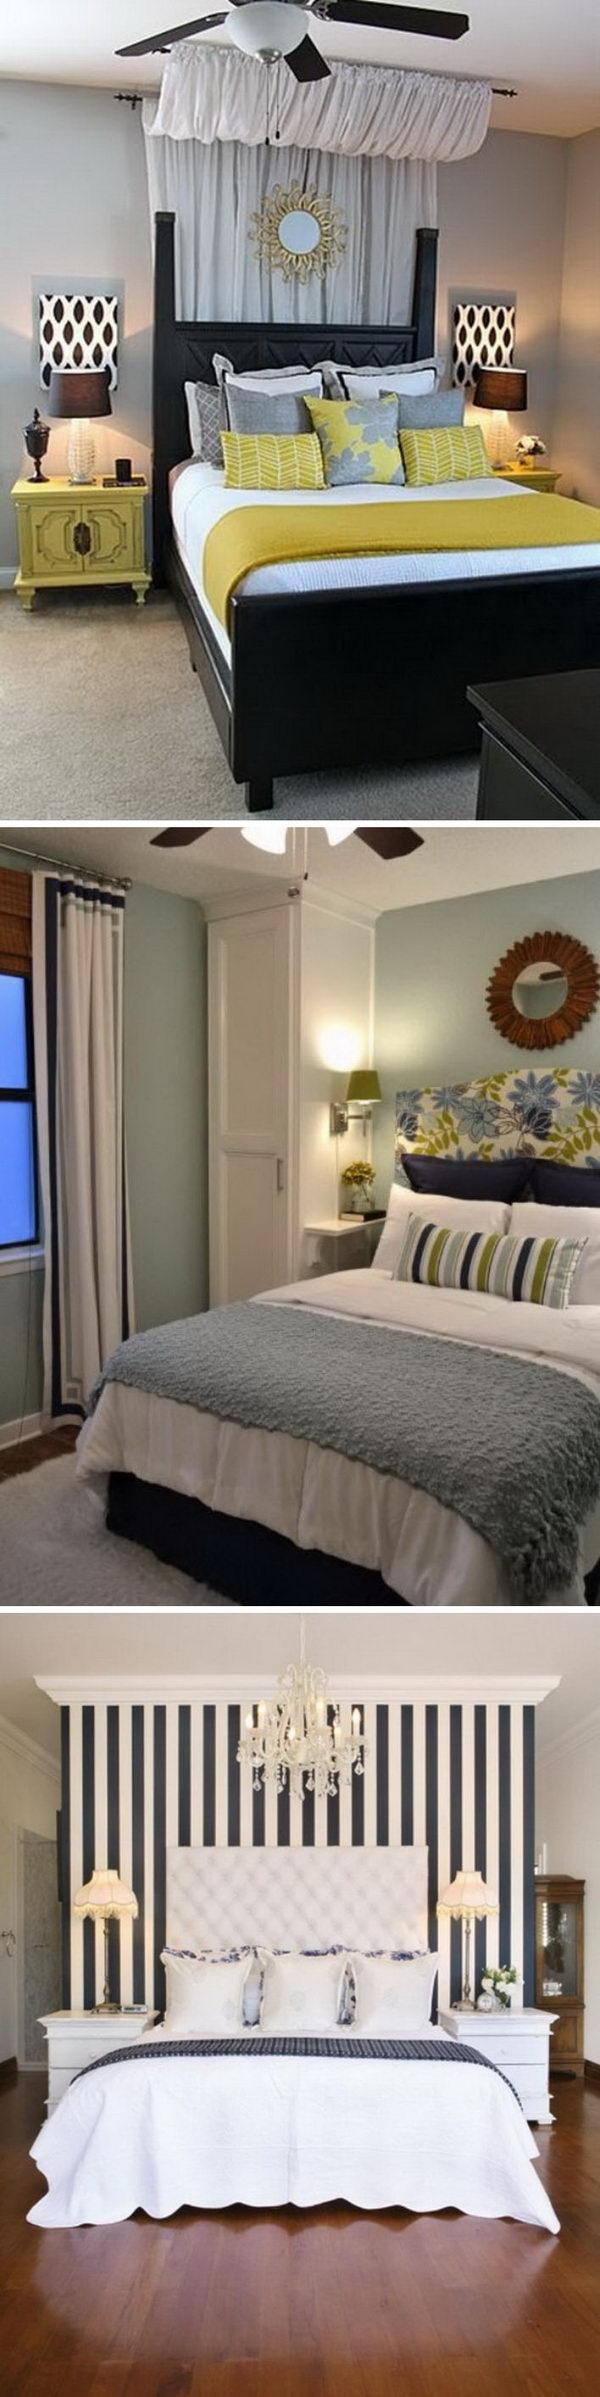 Creative Ways To Make Your Small Bedroom Look Bigger.